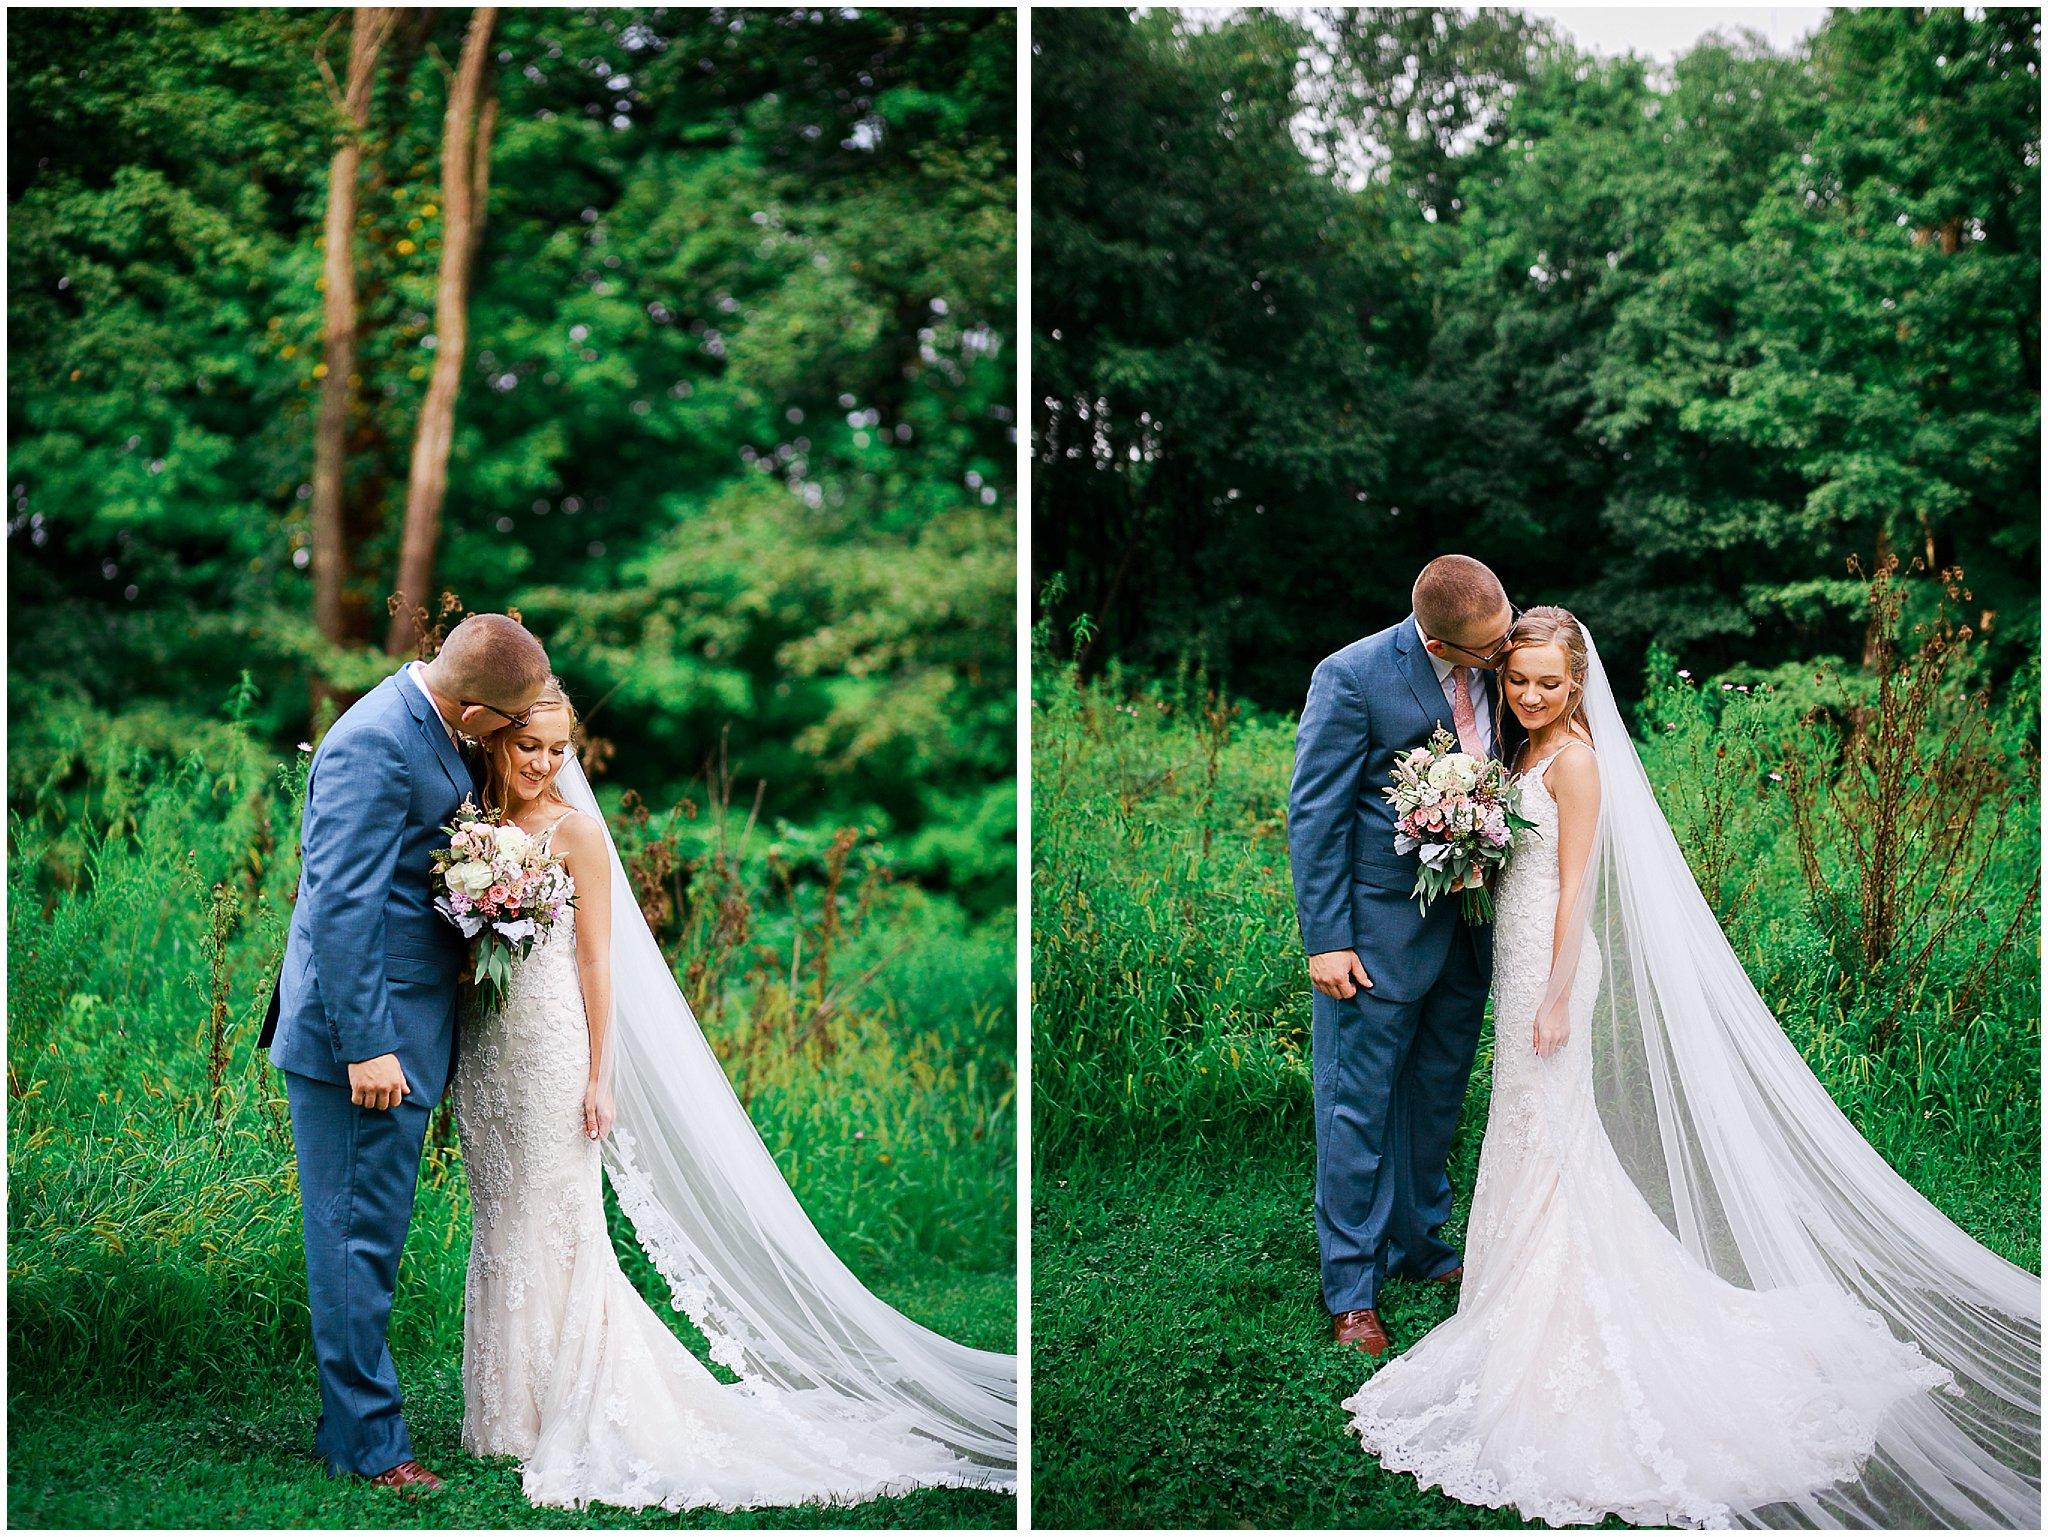 Preston Barn Old Drovers Inn Wedding Rustic Wedding Hudson Valley Photographer Sweet Alice Photography54.jpg